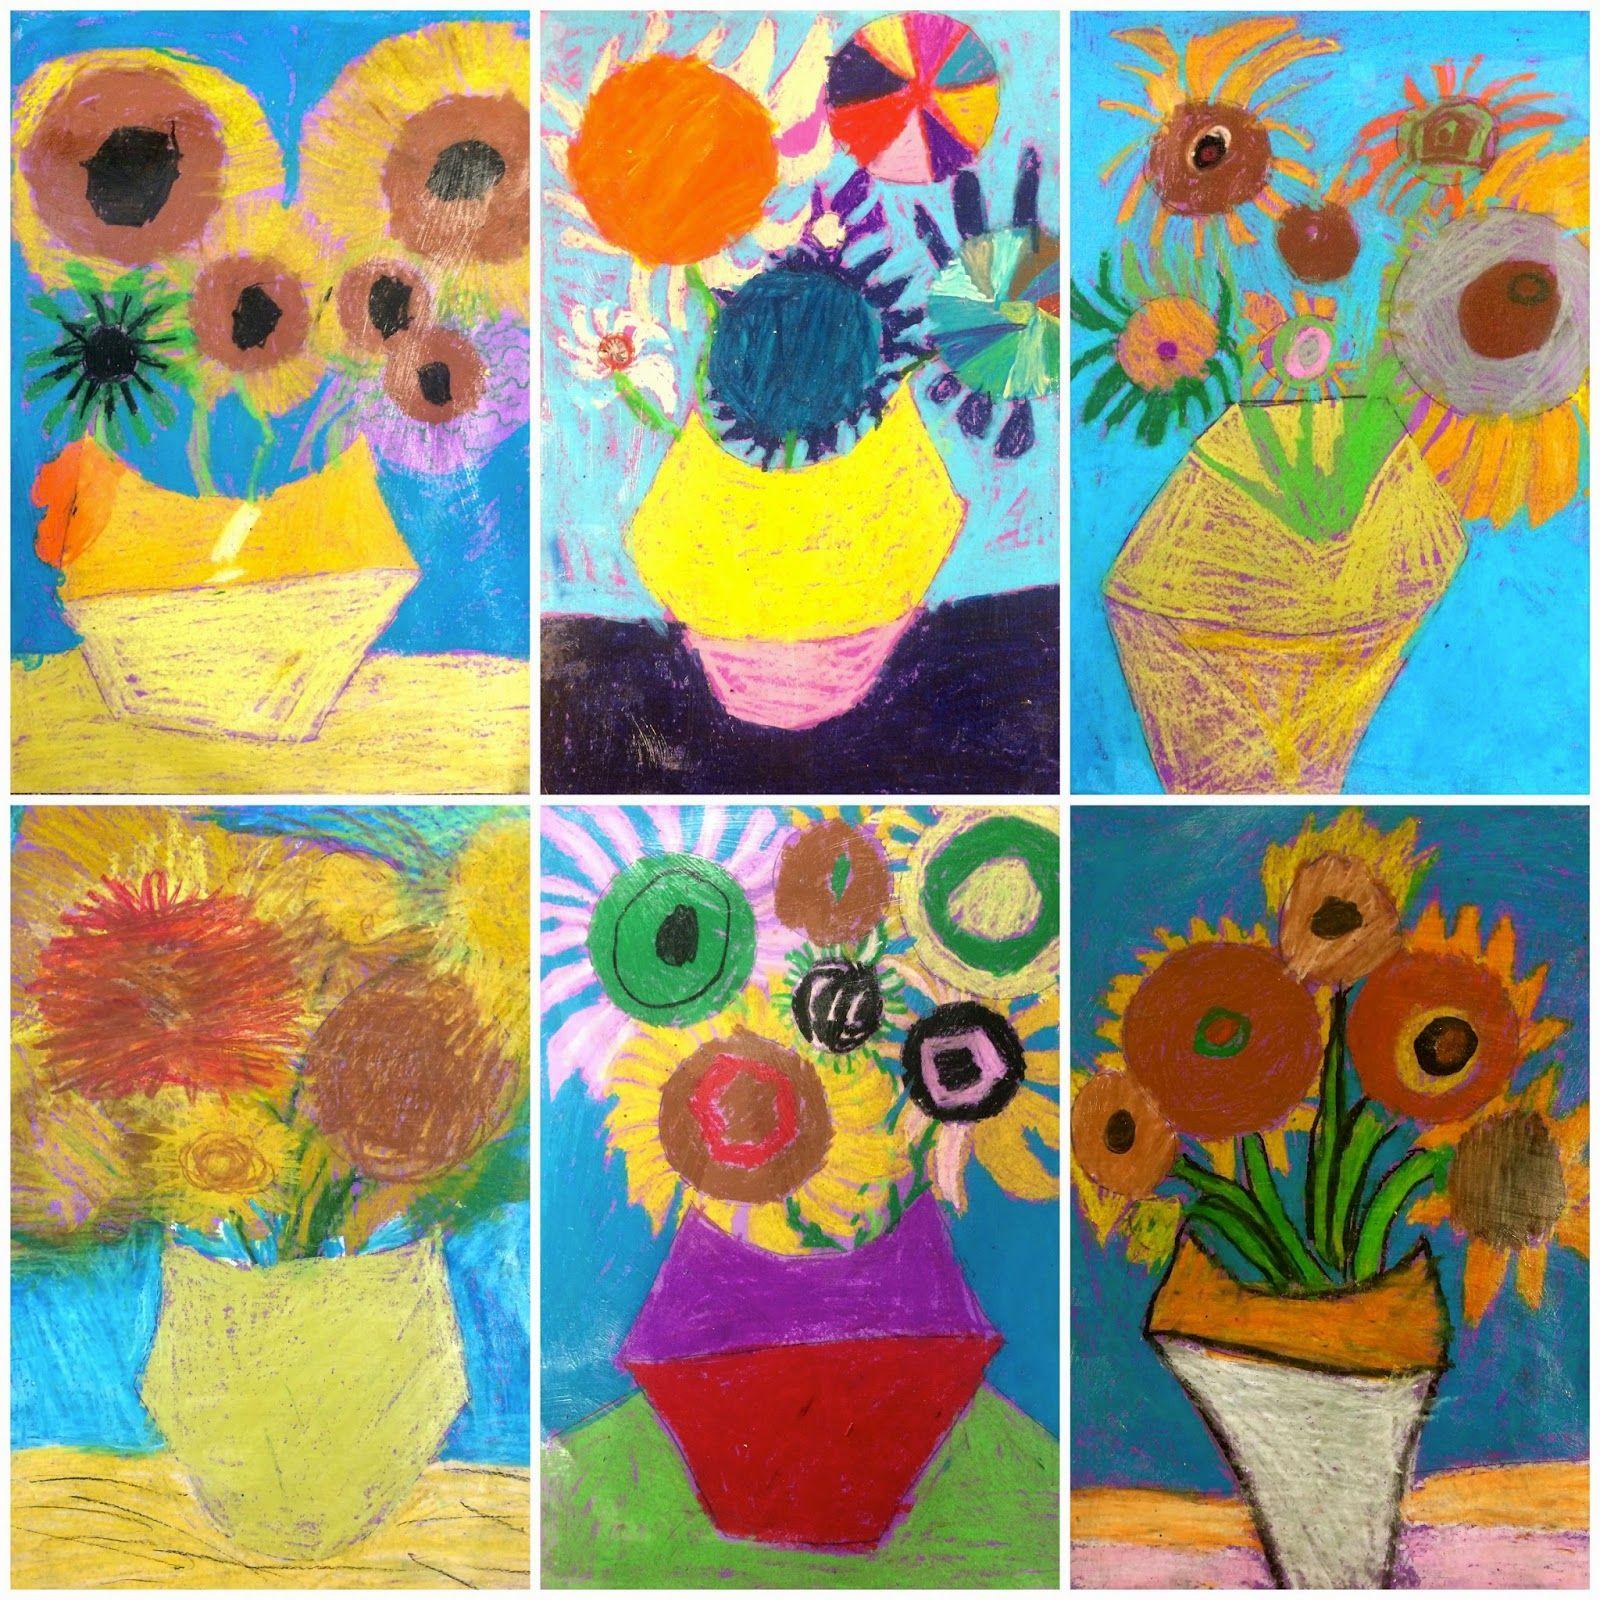 Exploring Art Elementary Art 2nd Grade Van Gogh